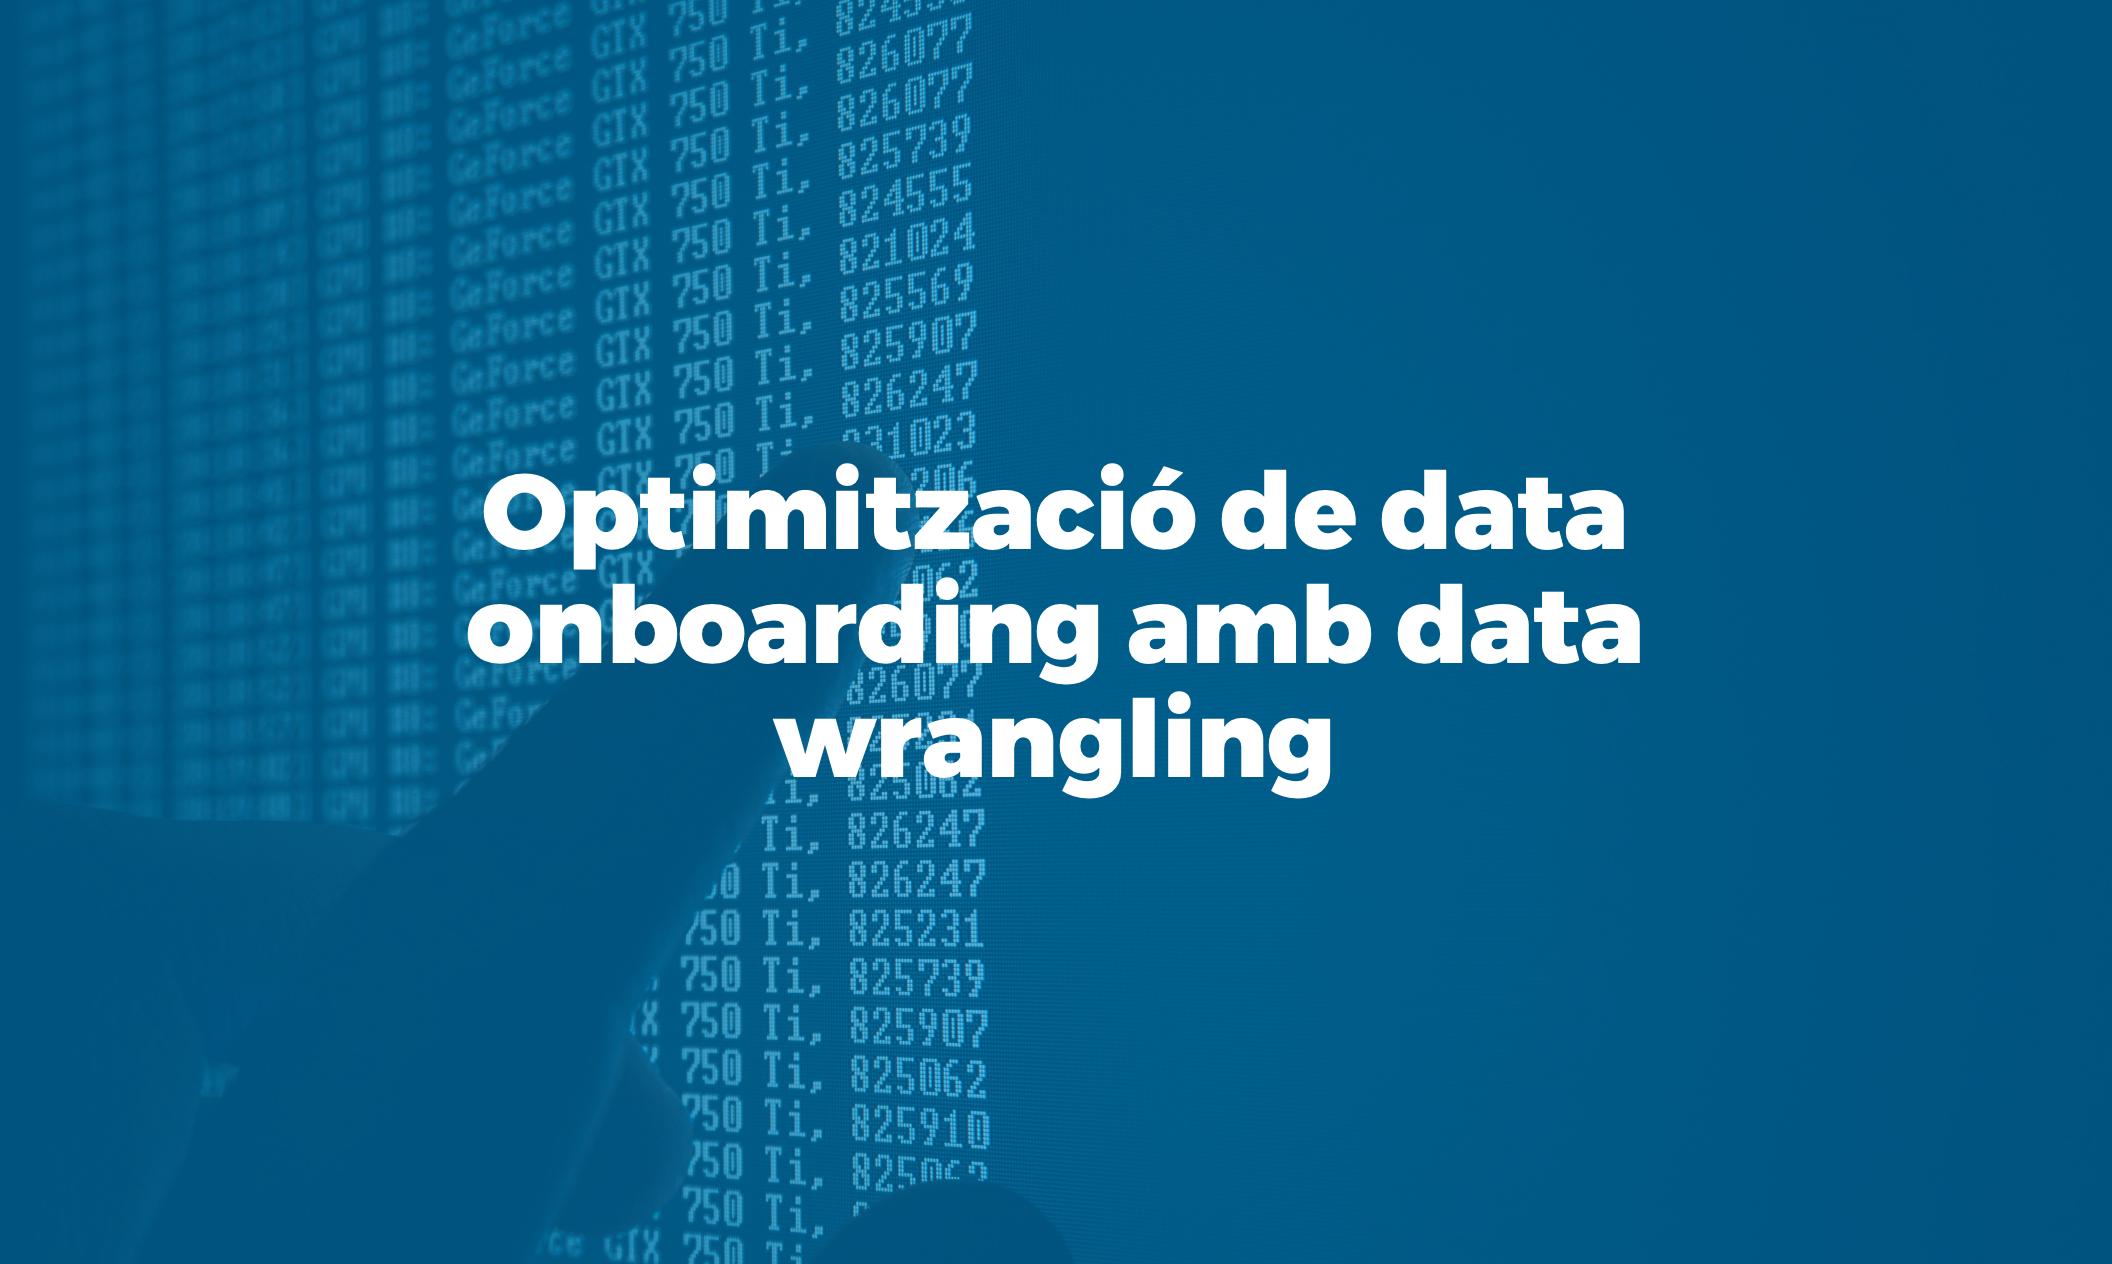 Bismart optimització data onboarding data wrangling Azure